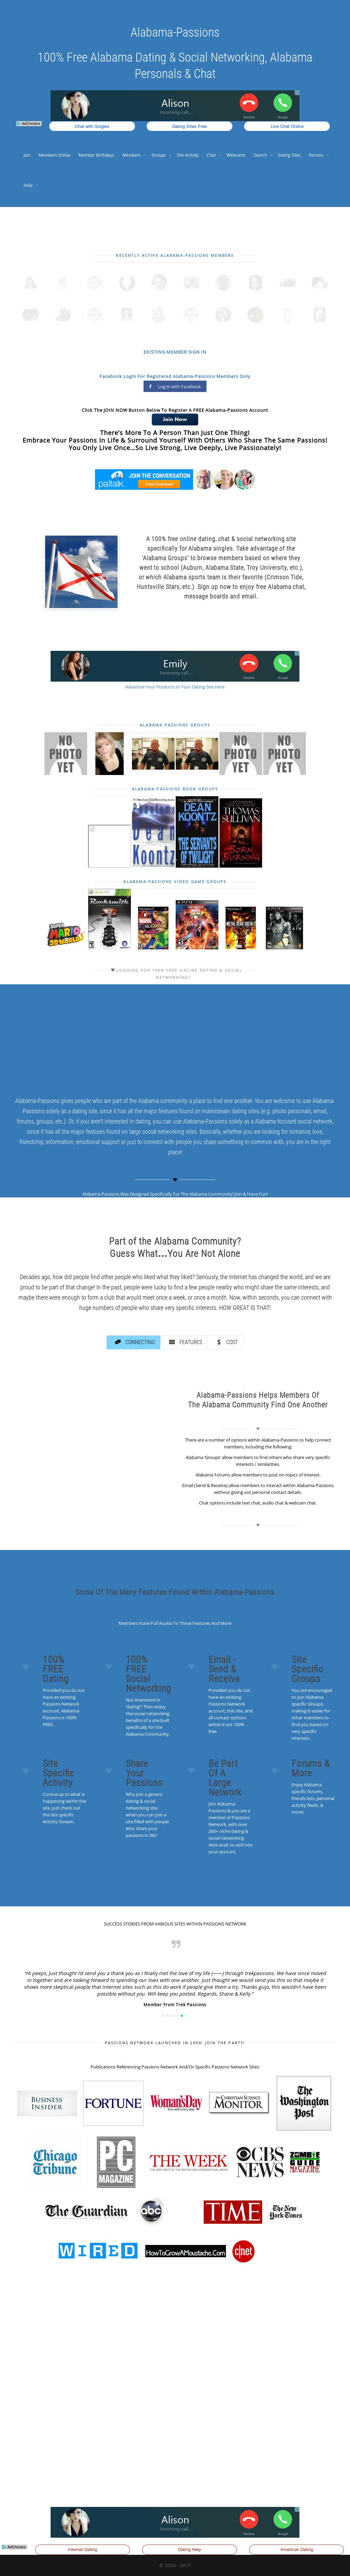 Alabama singles chat